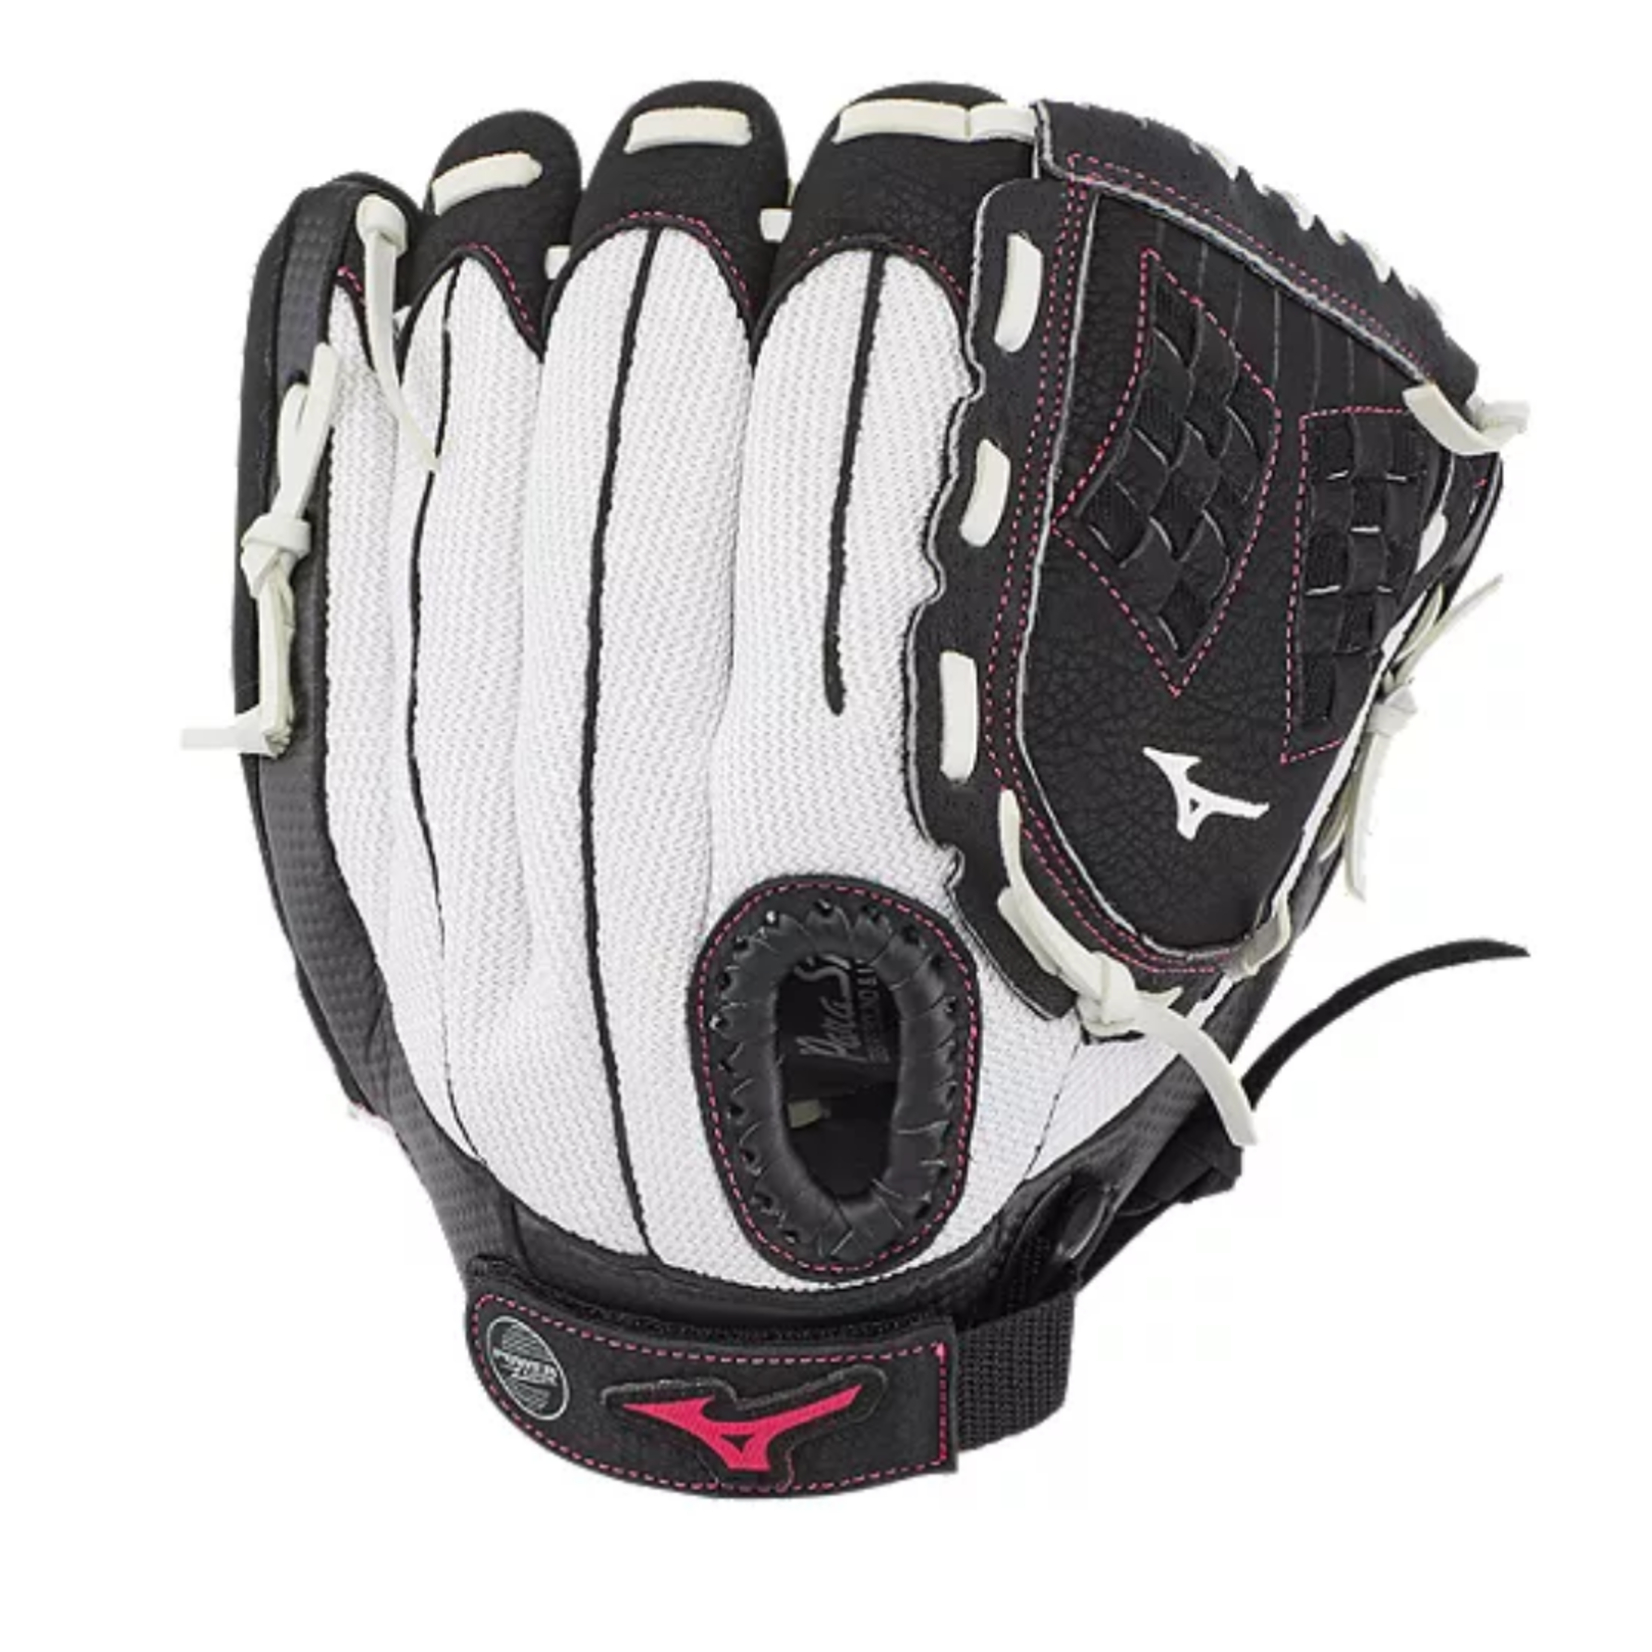 "Mizuno Prospect Finch FP Yth Glove - 11.5"""